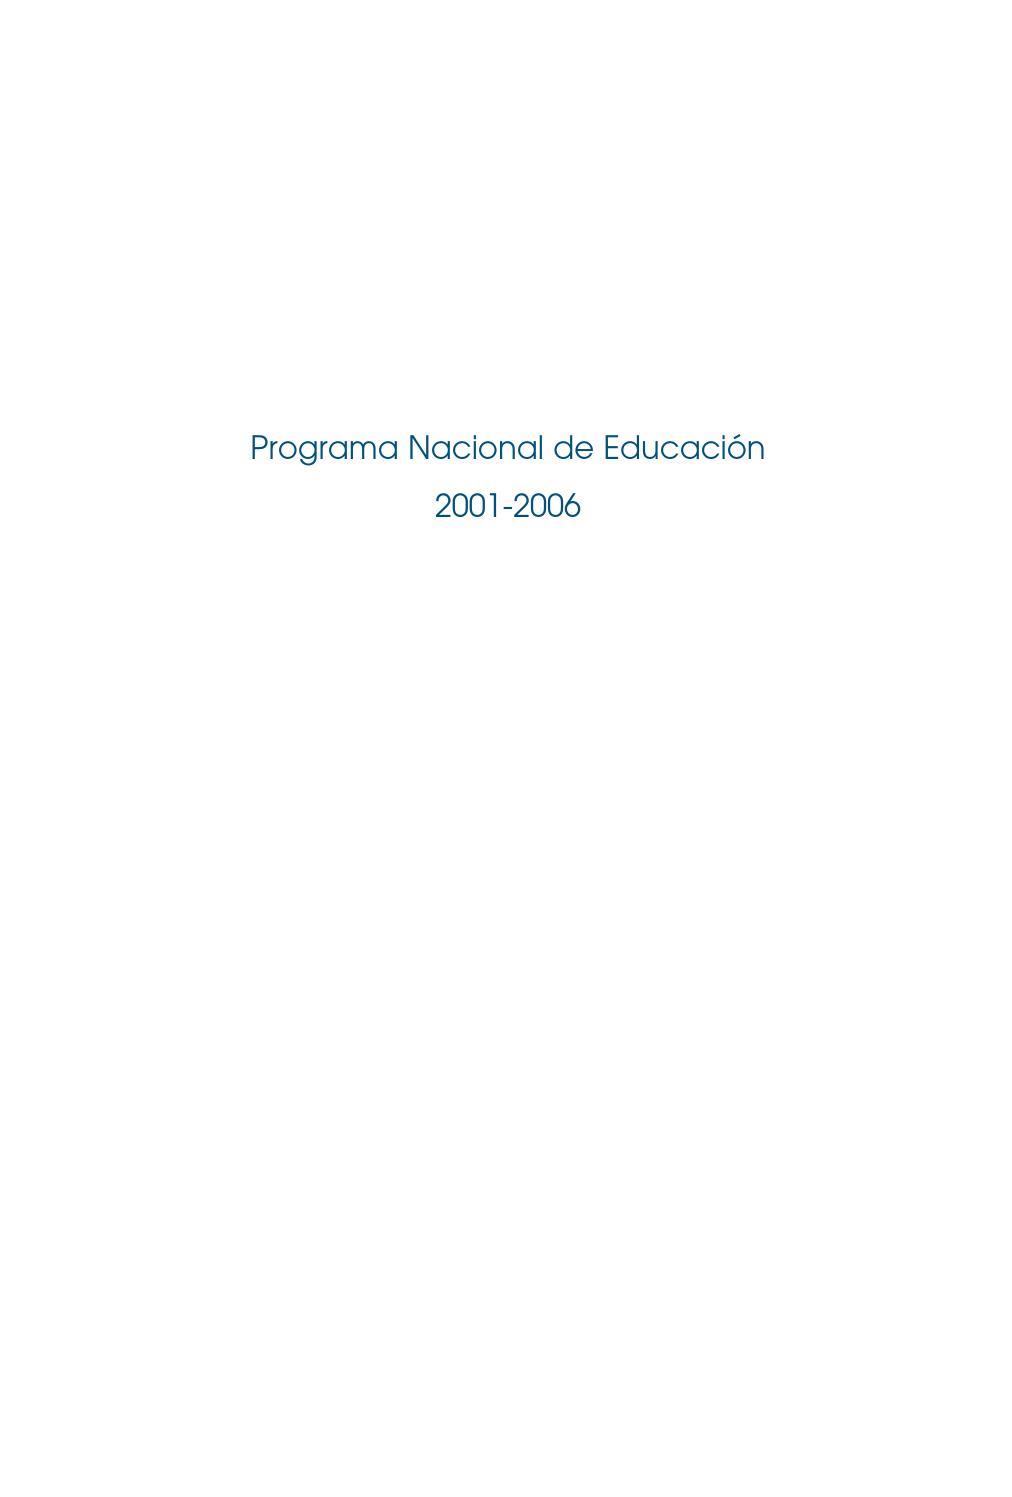 Programa Nacional de Educación 2001-2006 by jrr silerio - issuu